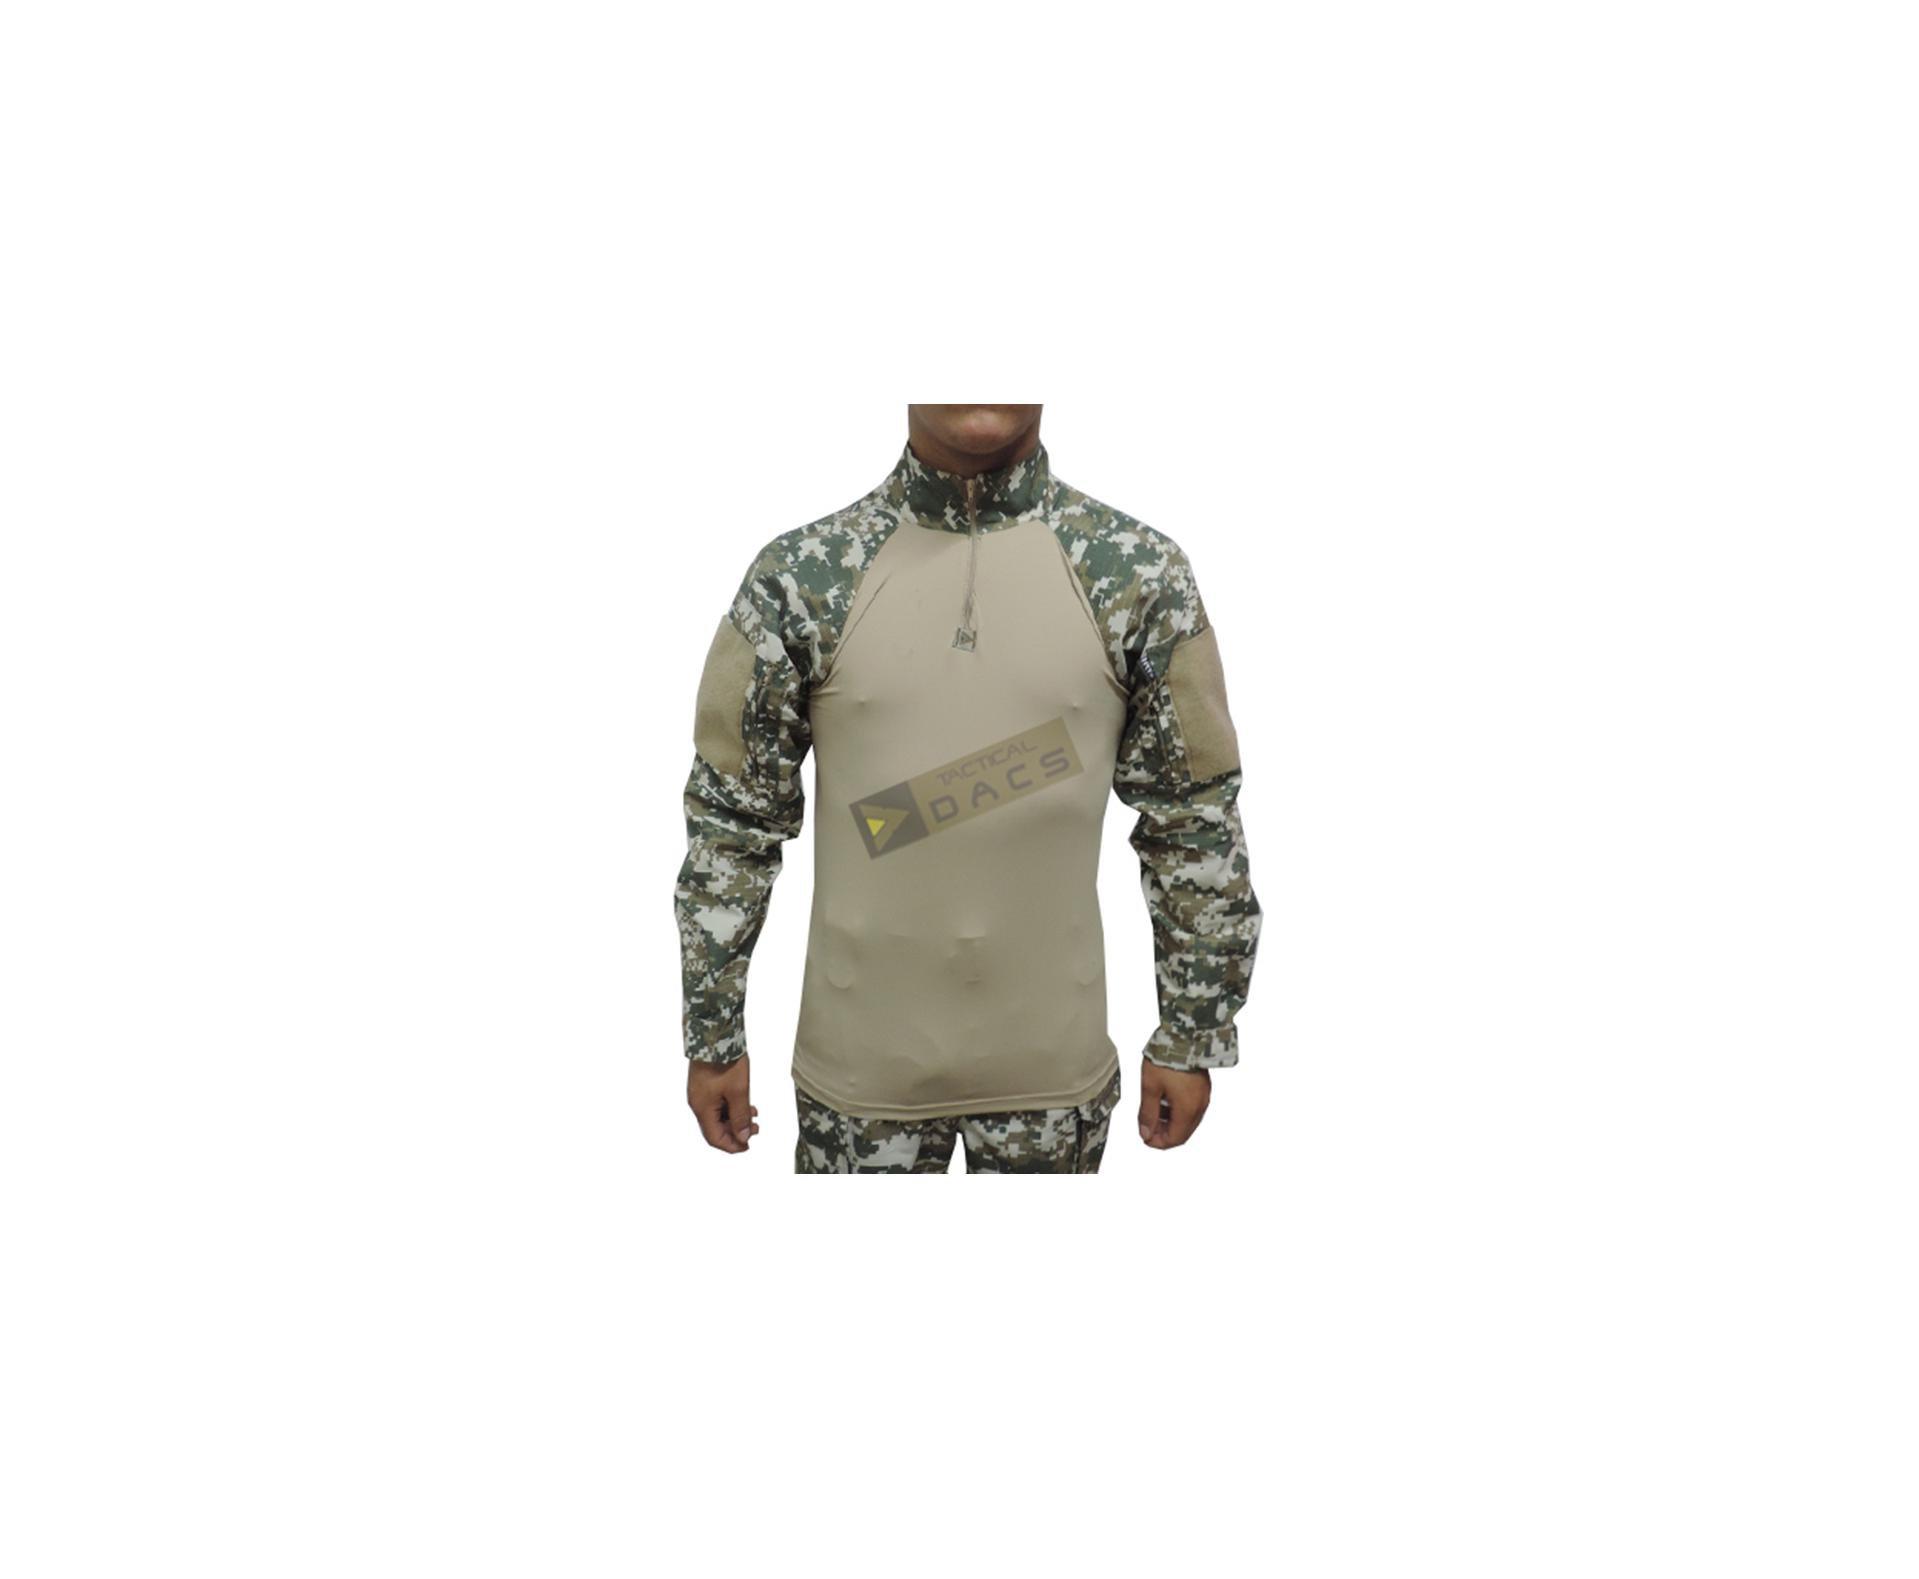 Camisa Combat Shirt Hrt - Digital Cerrado - Dacs